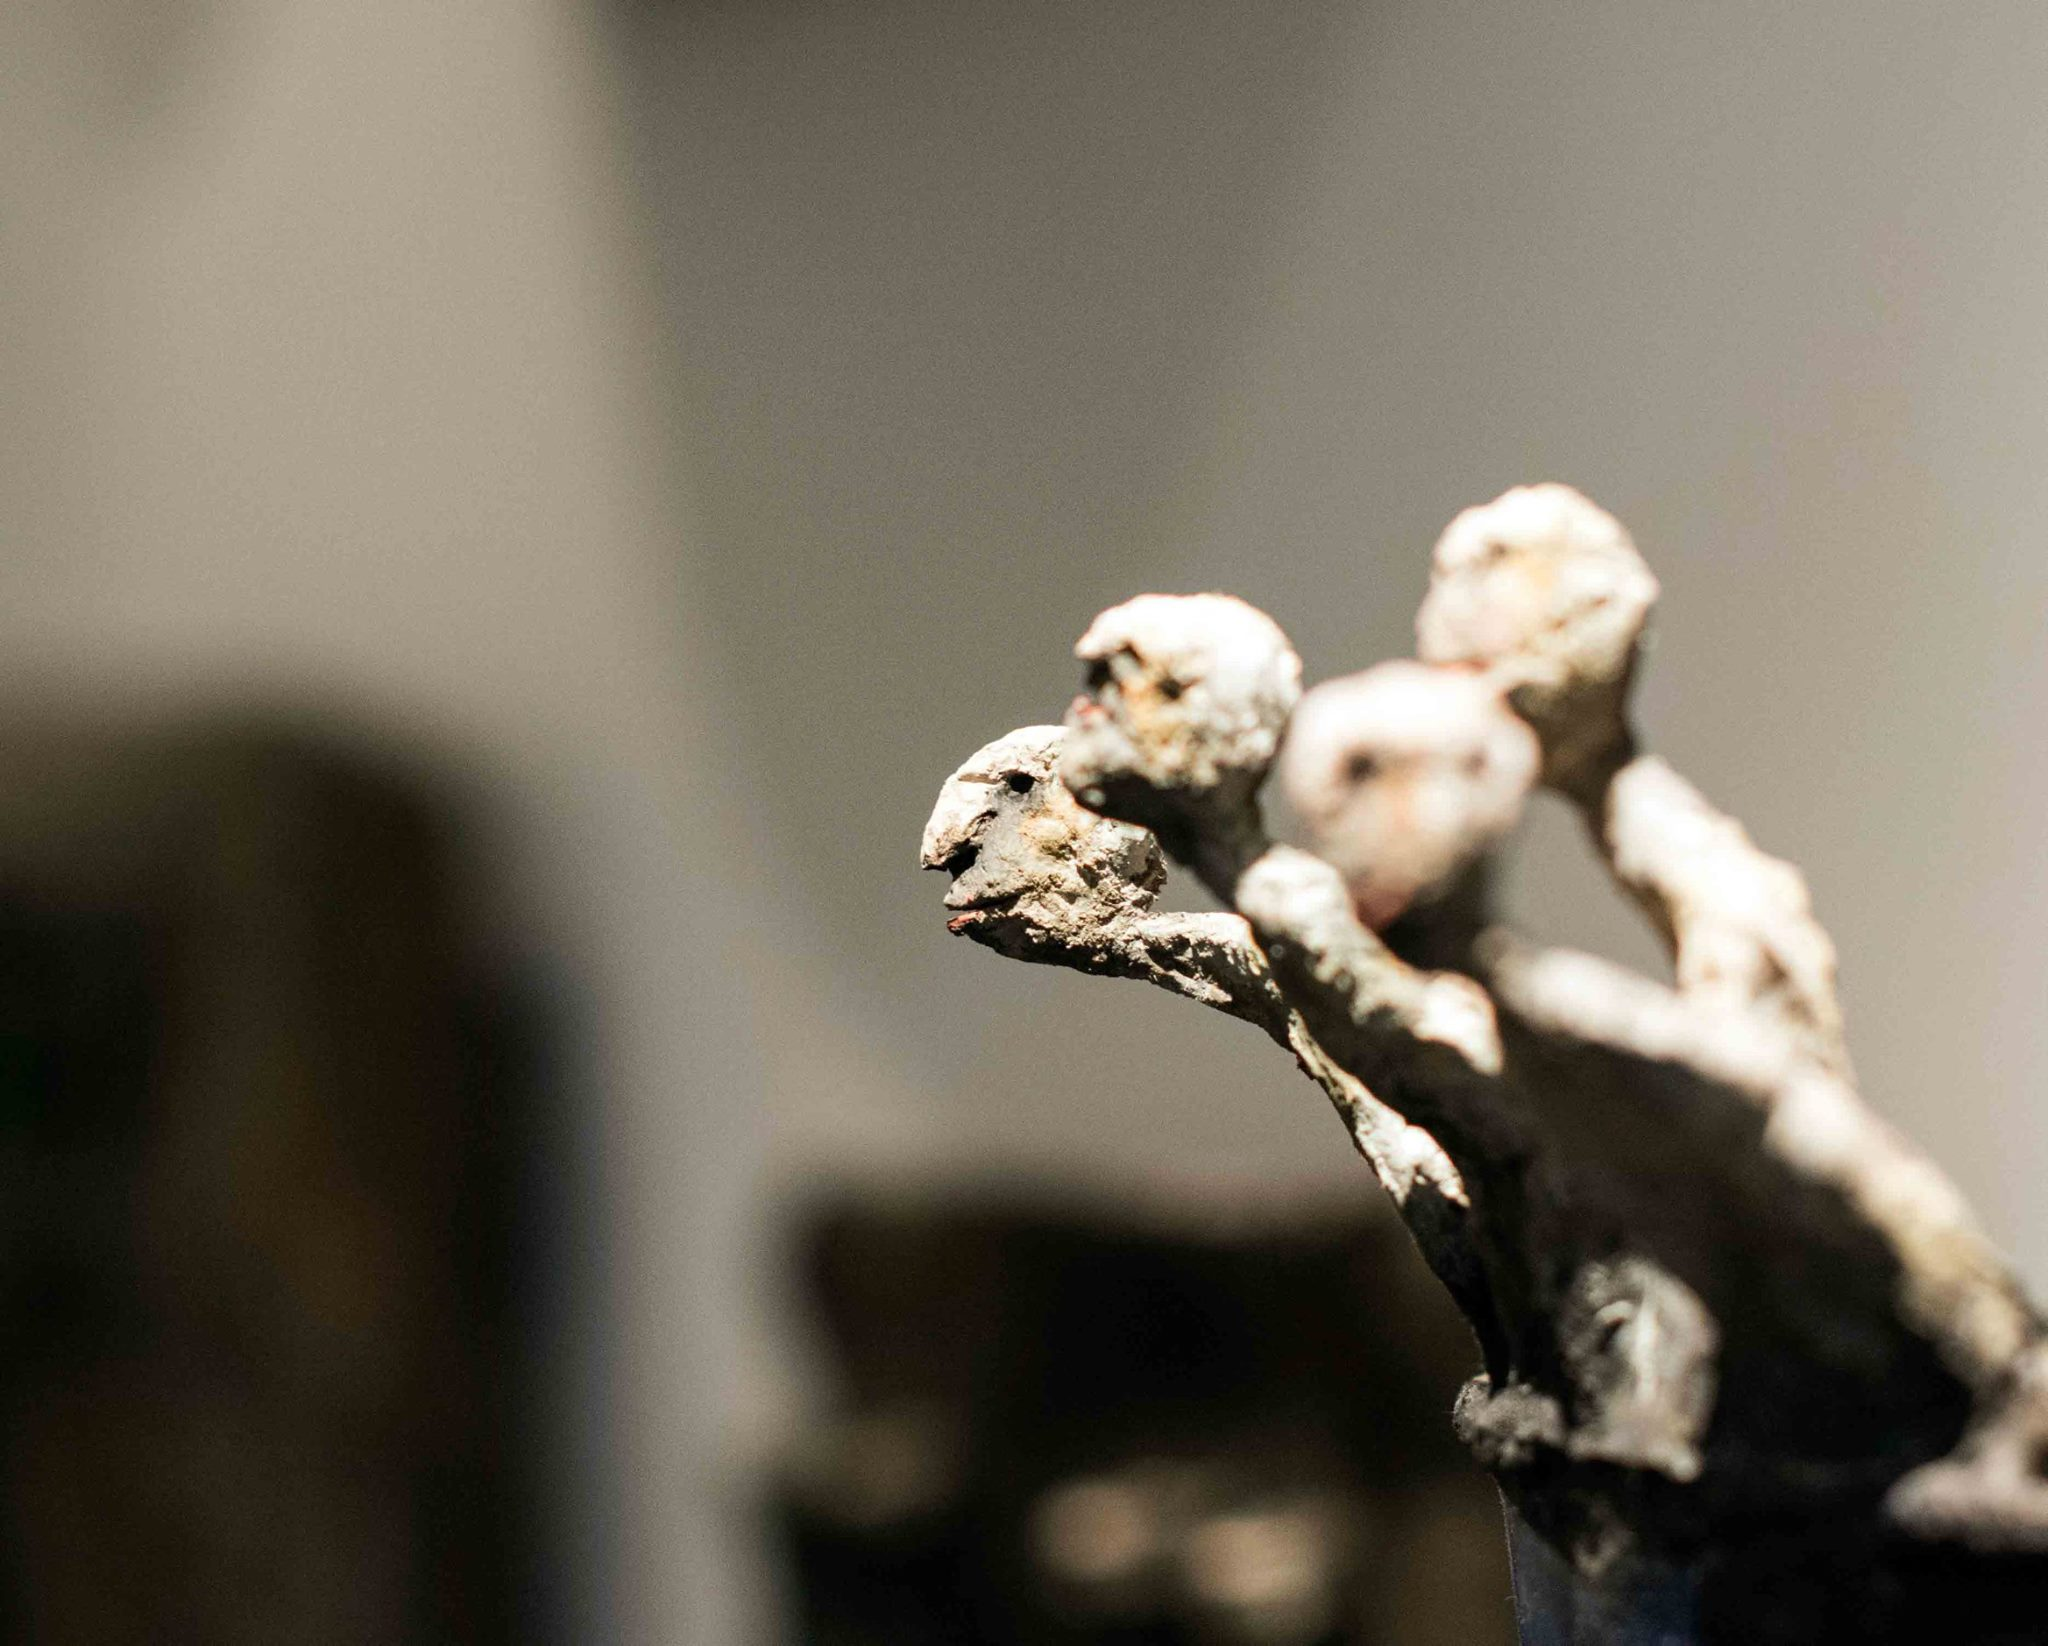 gerard cambon – Sculpture